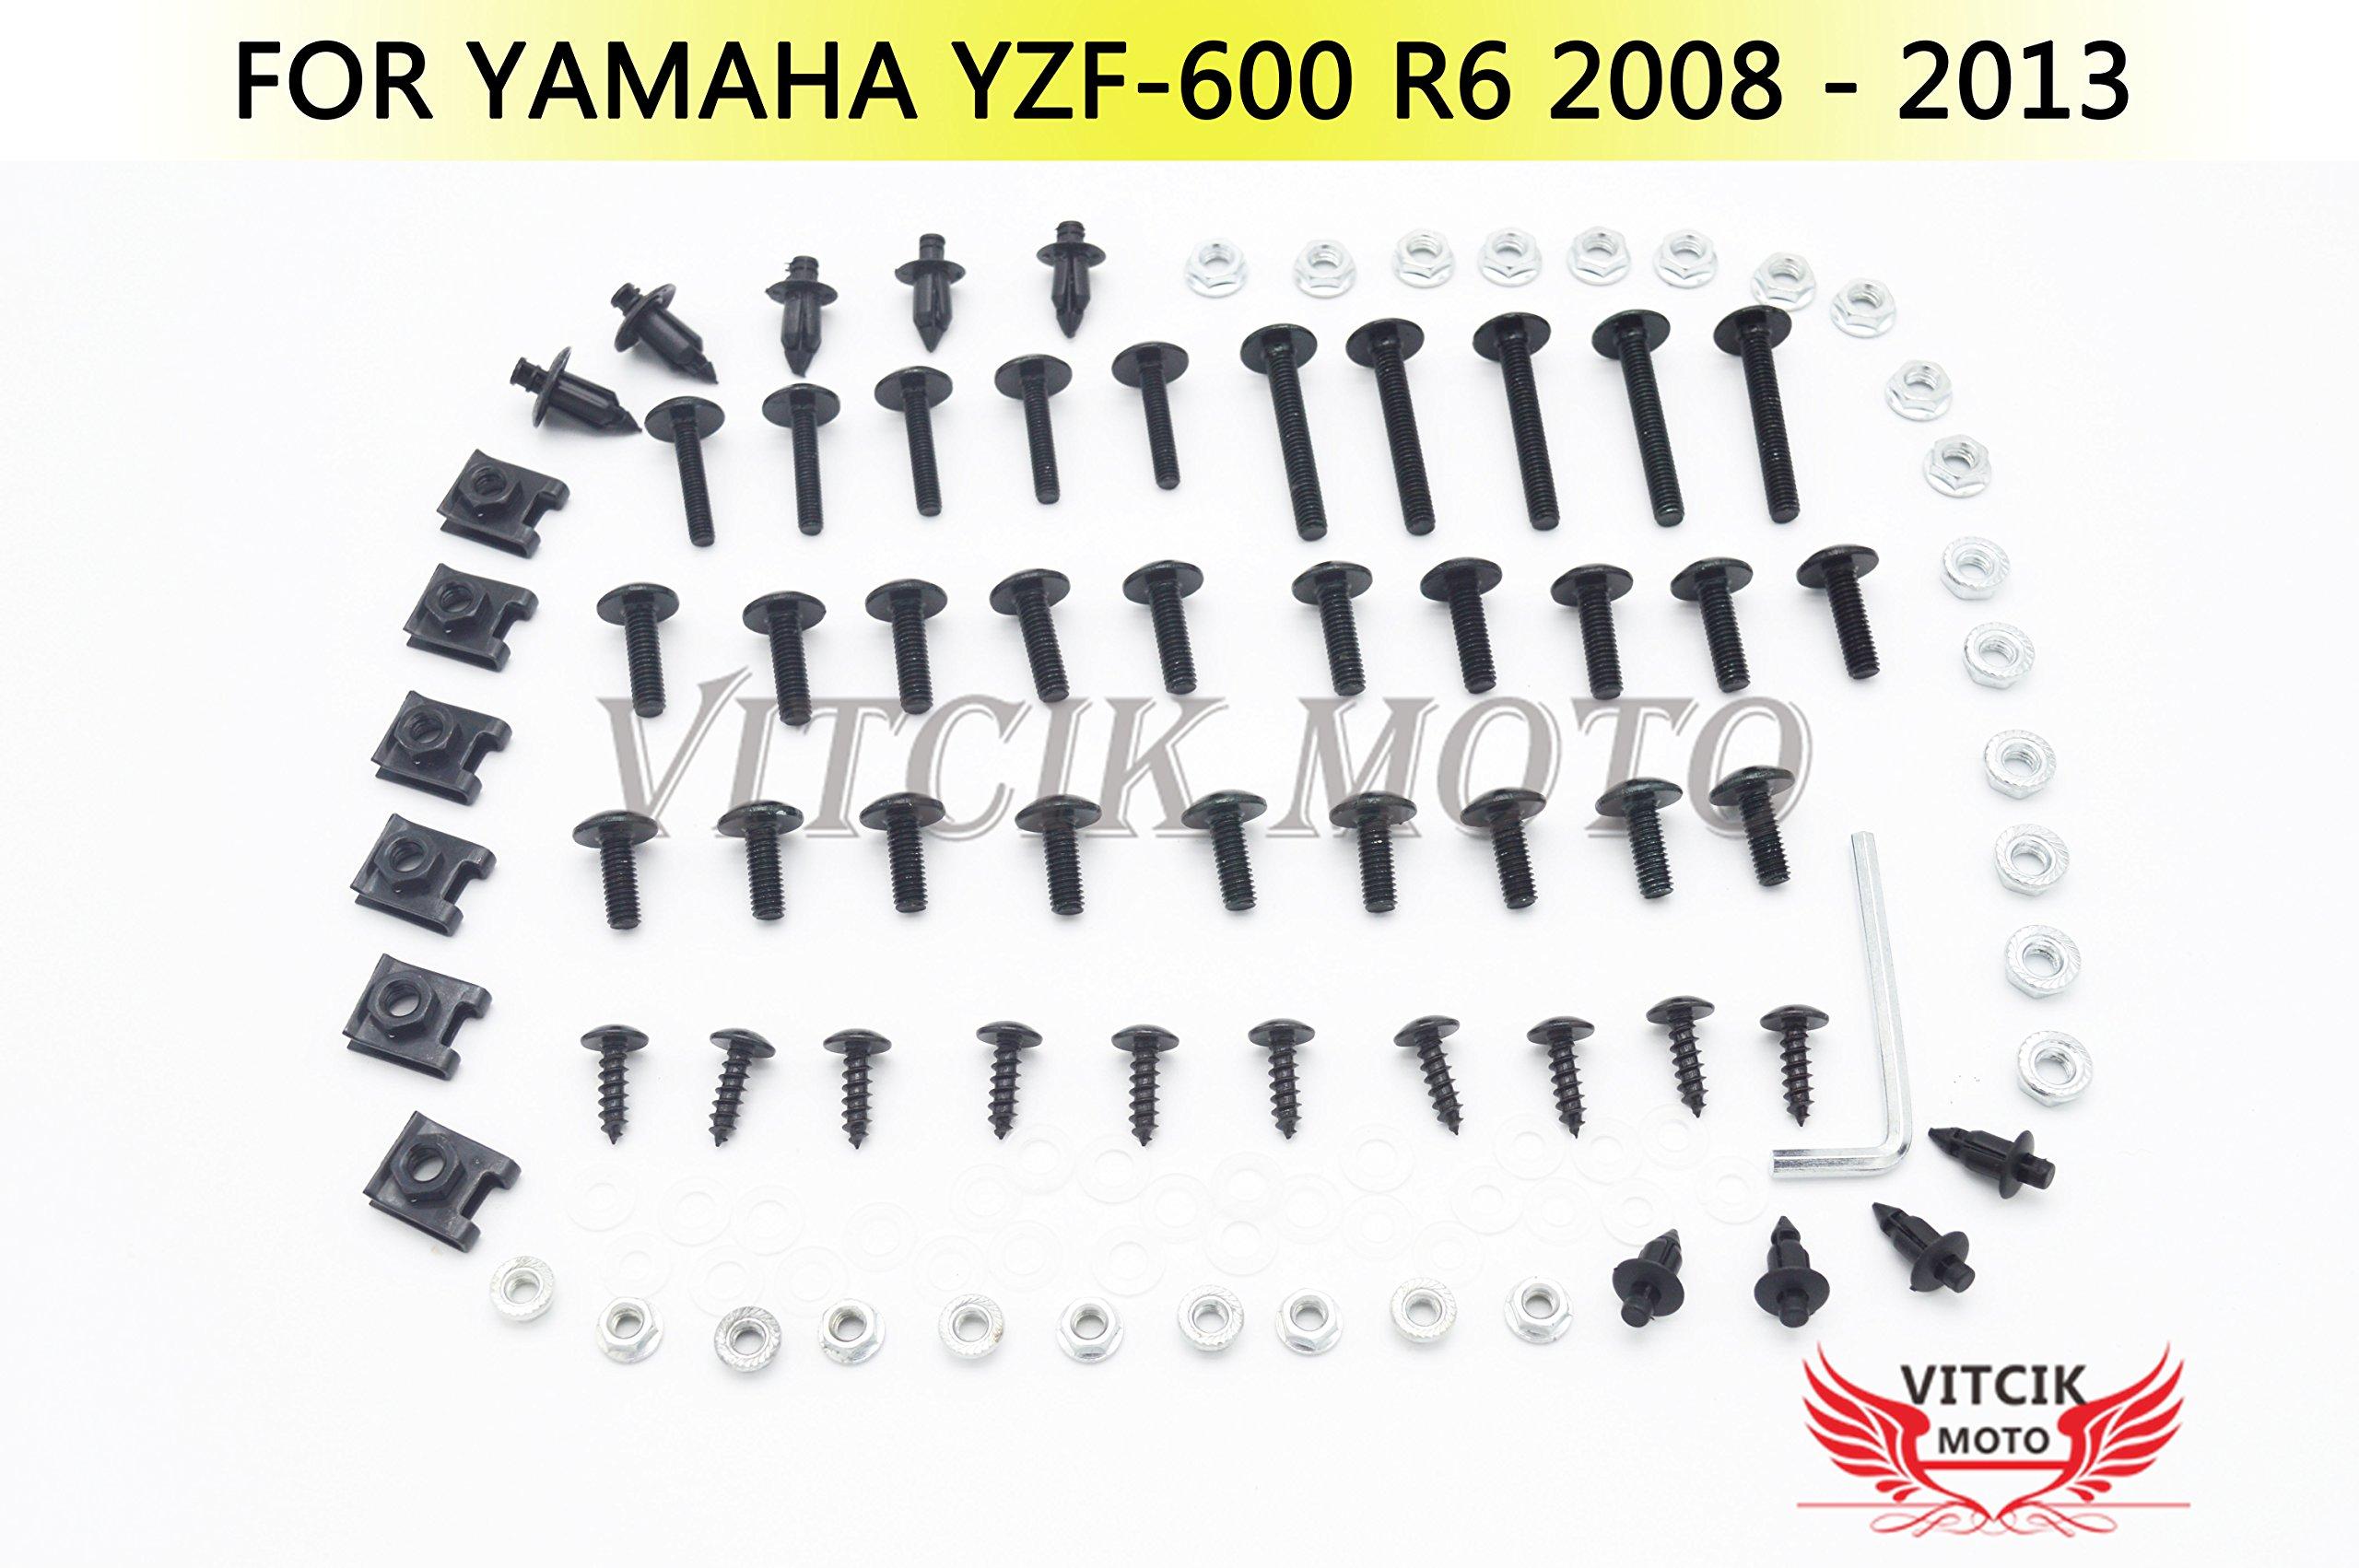 VITCIK Full Fairings Bolt Screw Kits for Yamaha YZF - 600 R6 2008 2009 2010 2011 2012 2013 Motorcycle Fastener CNC Aluminium Clips (Black & Silver)